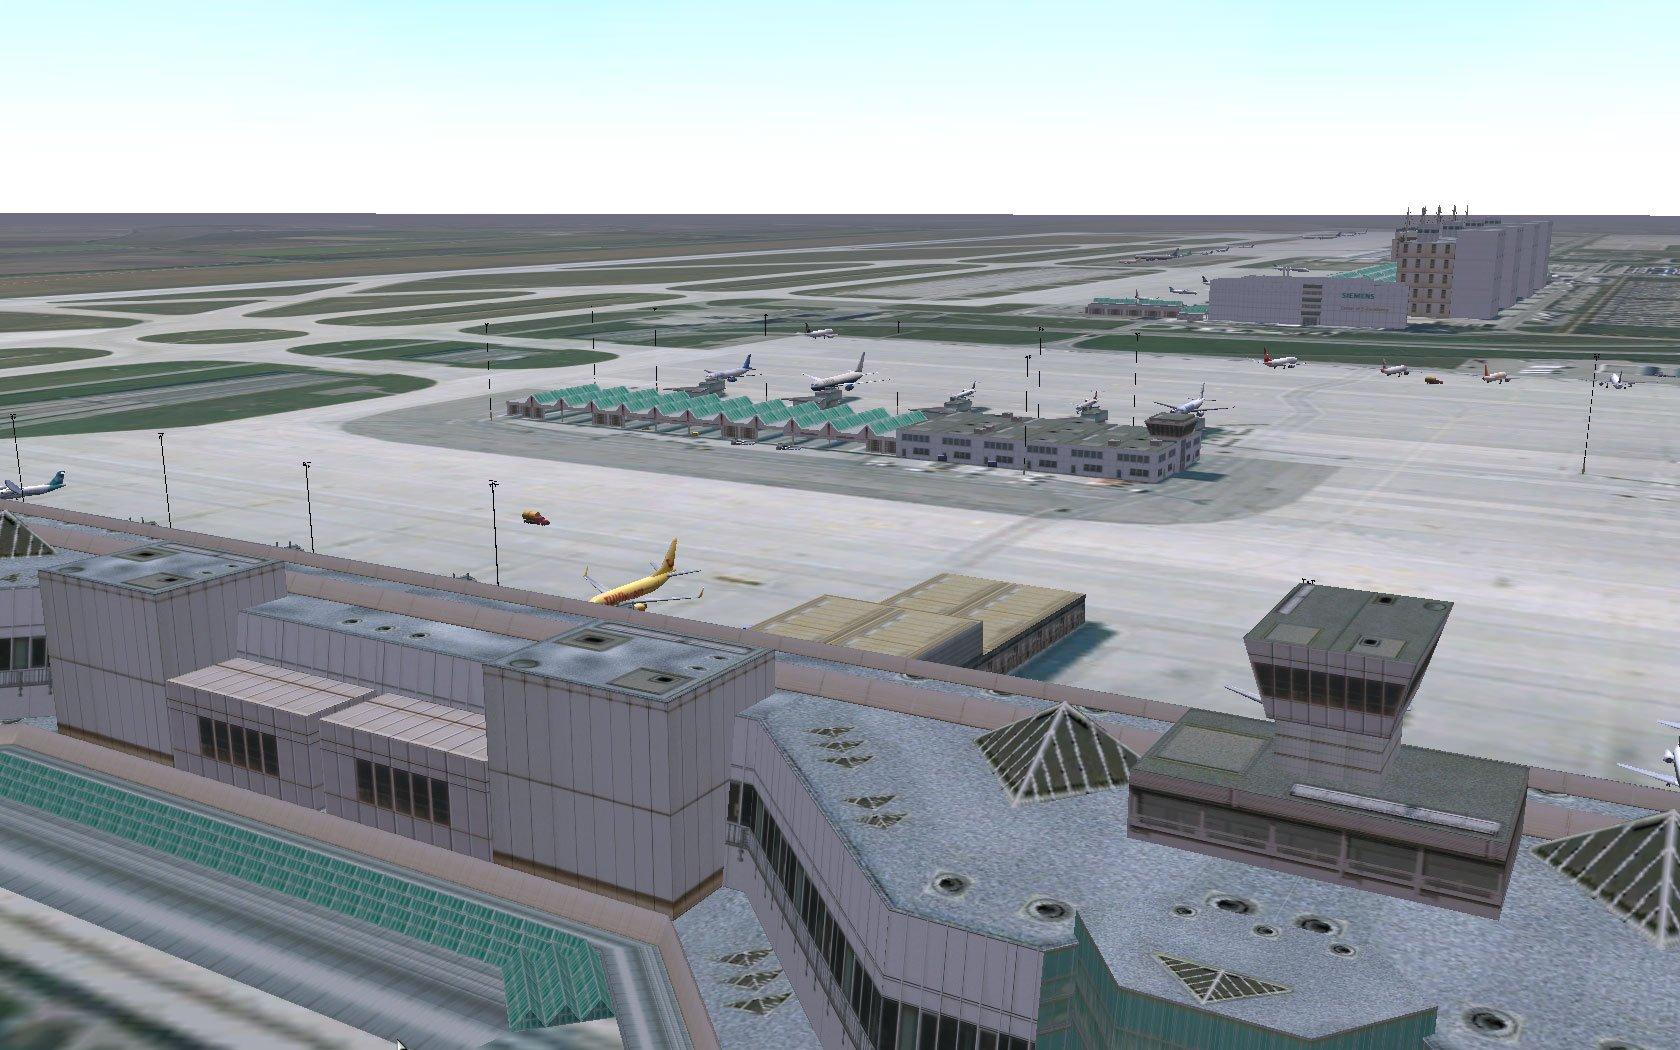 seaport airport traffic simulator - HD1280×800